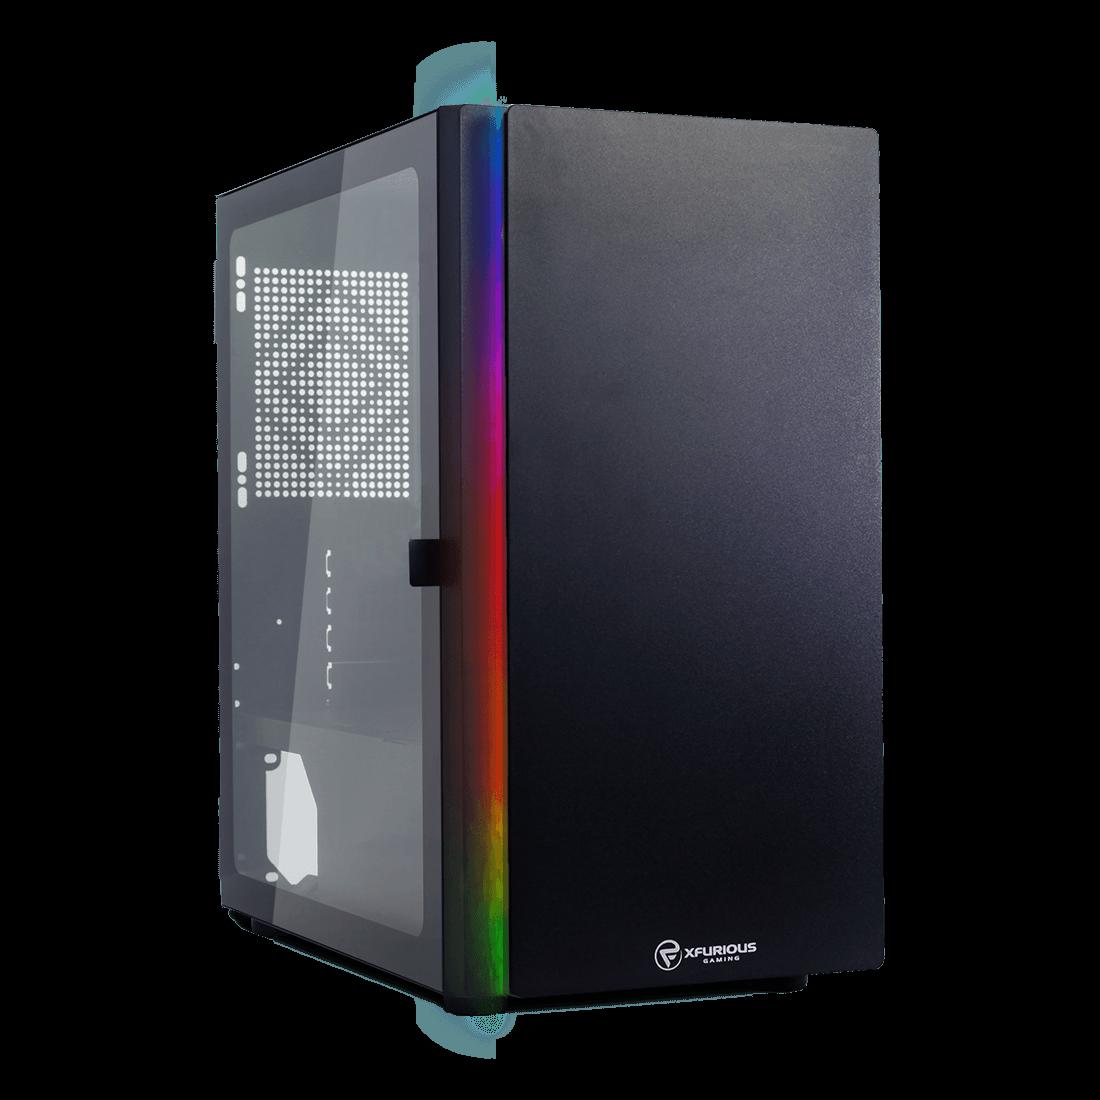 Computador Gamer Infohard Intel I5-10400F, 16GB DDR4, 500GB SSD NVME, GTX1660 6GB, 500W, H410M-H - 636660